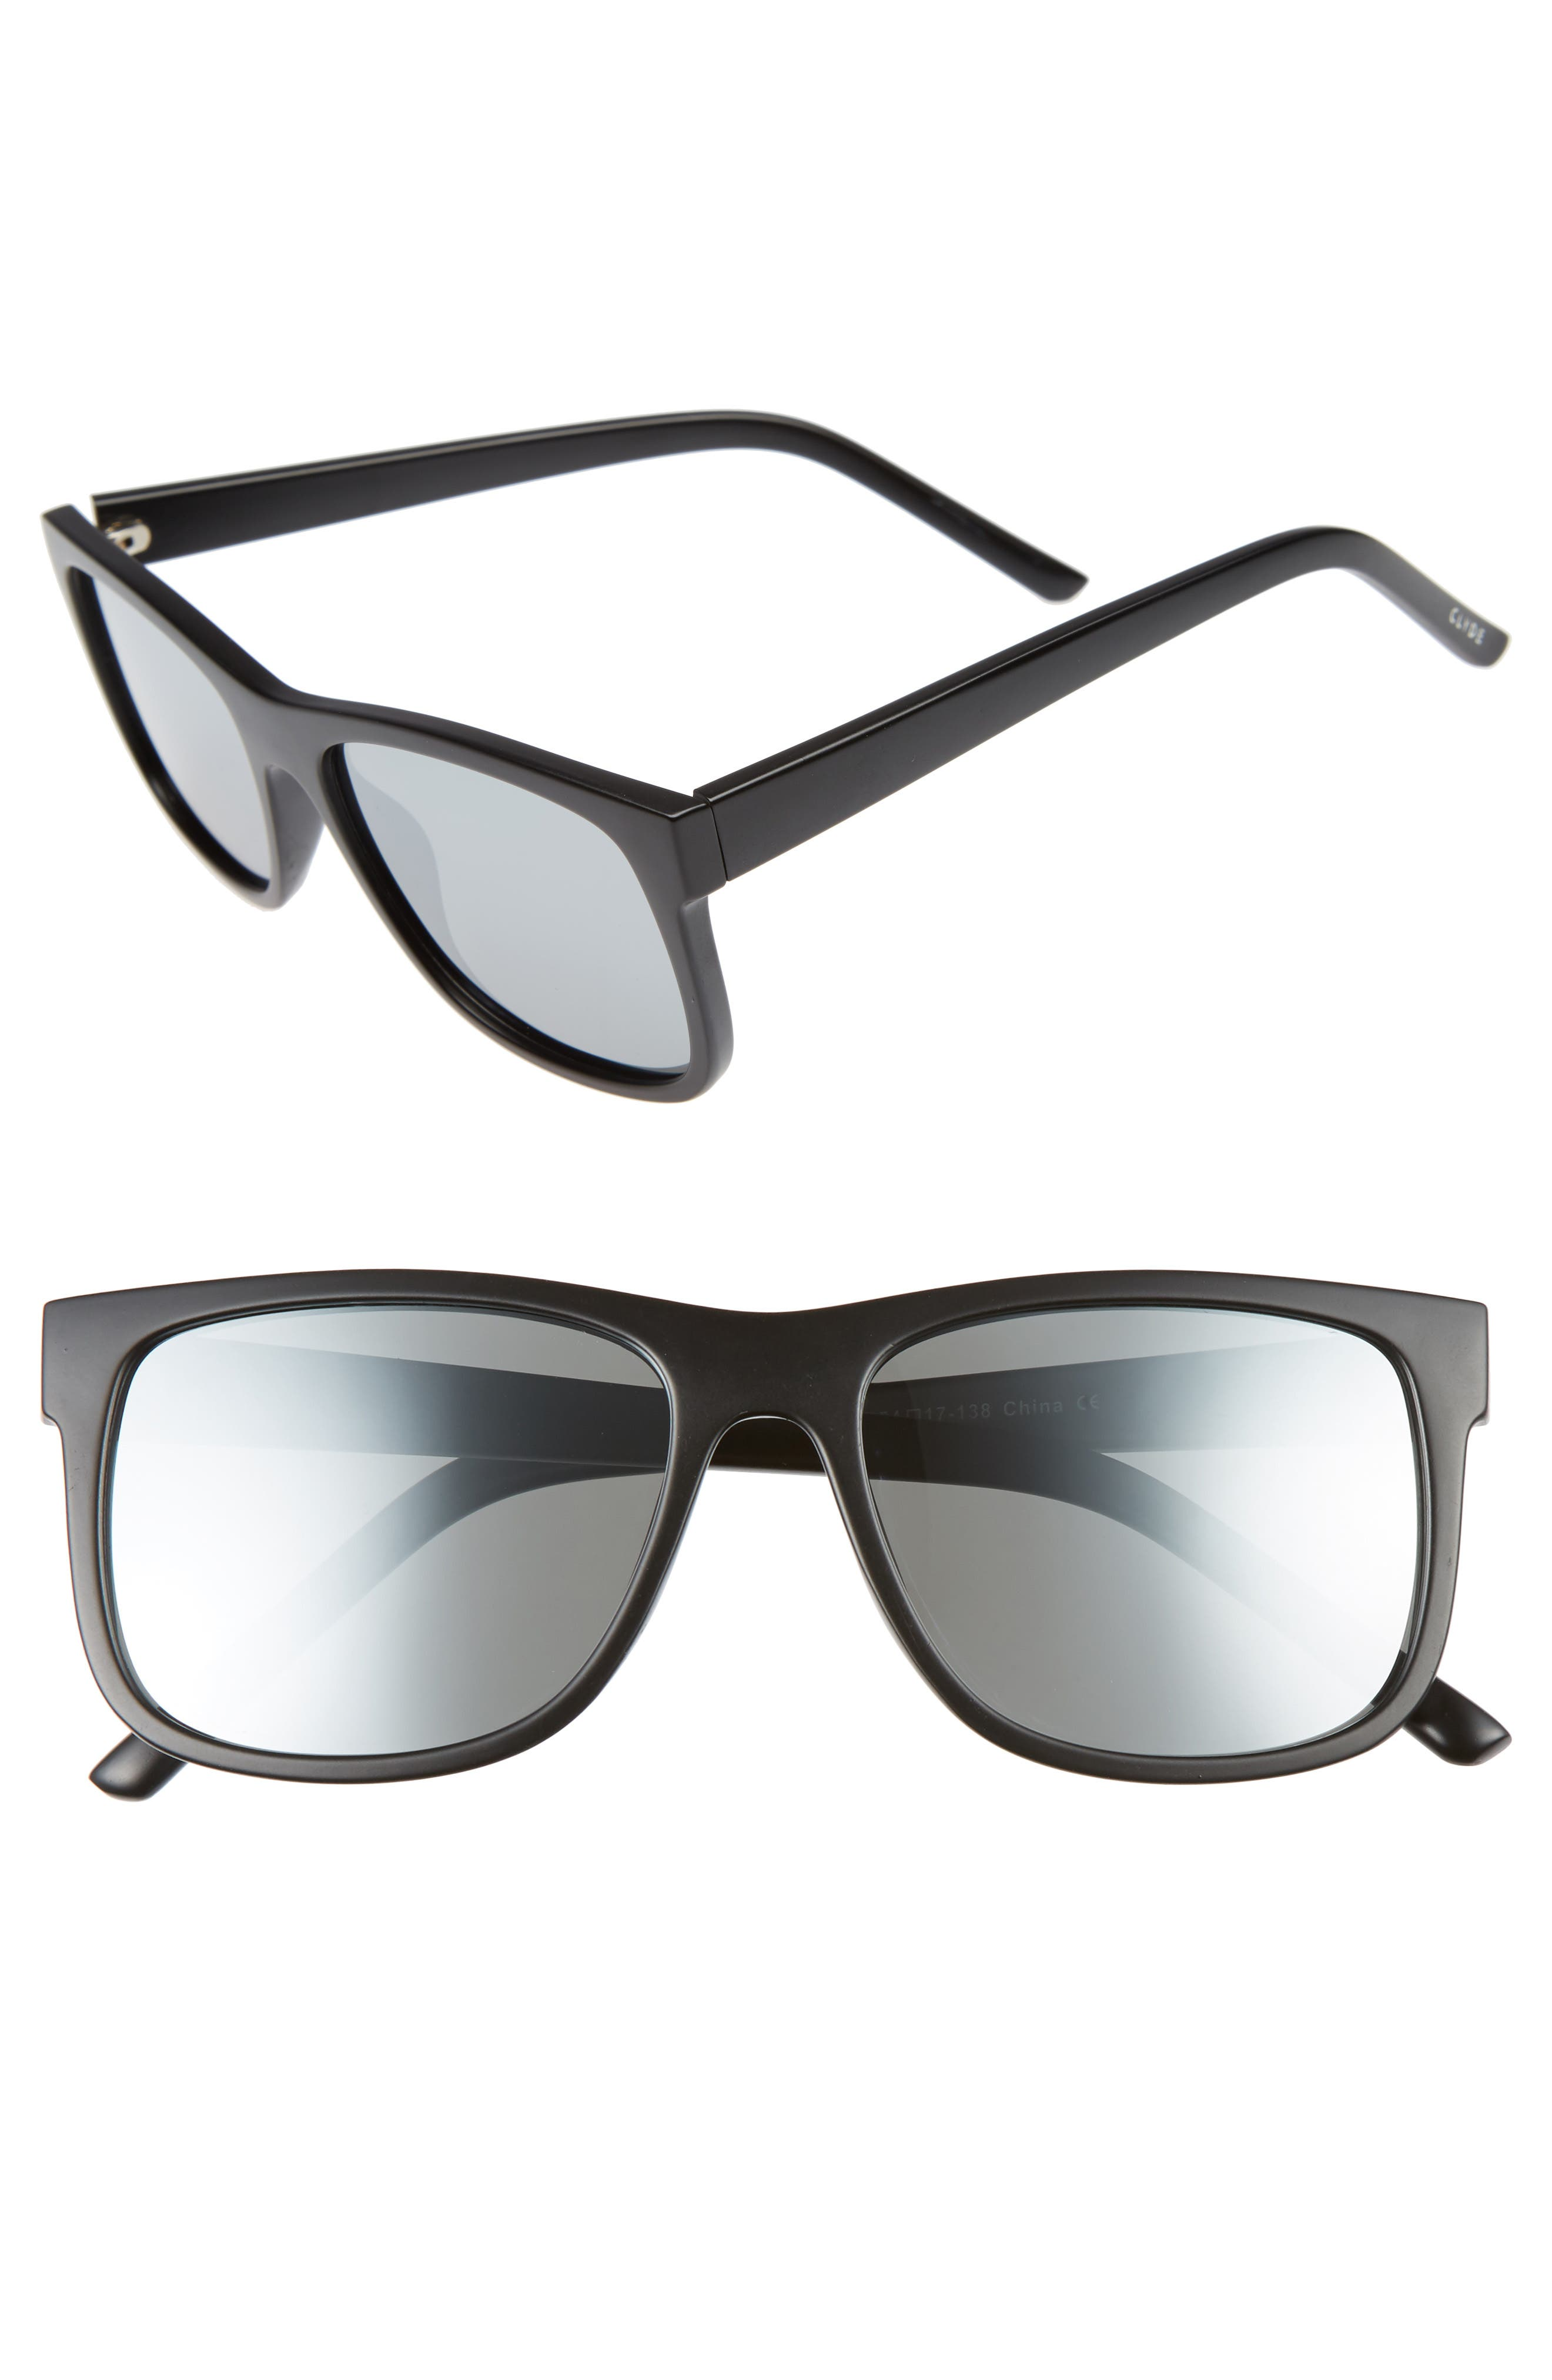 Bonnie Clyde Main 5m Polarized Sunglasses - Gravity Black